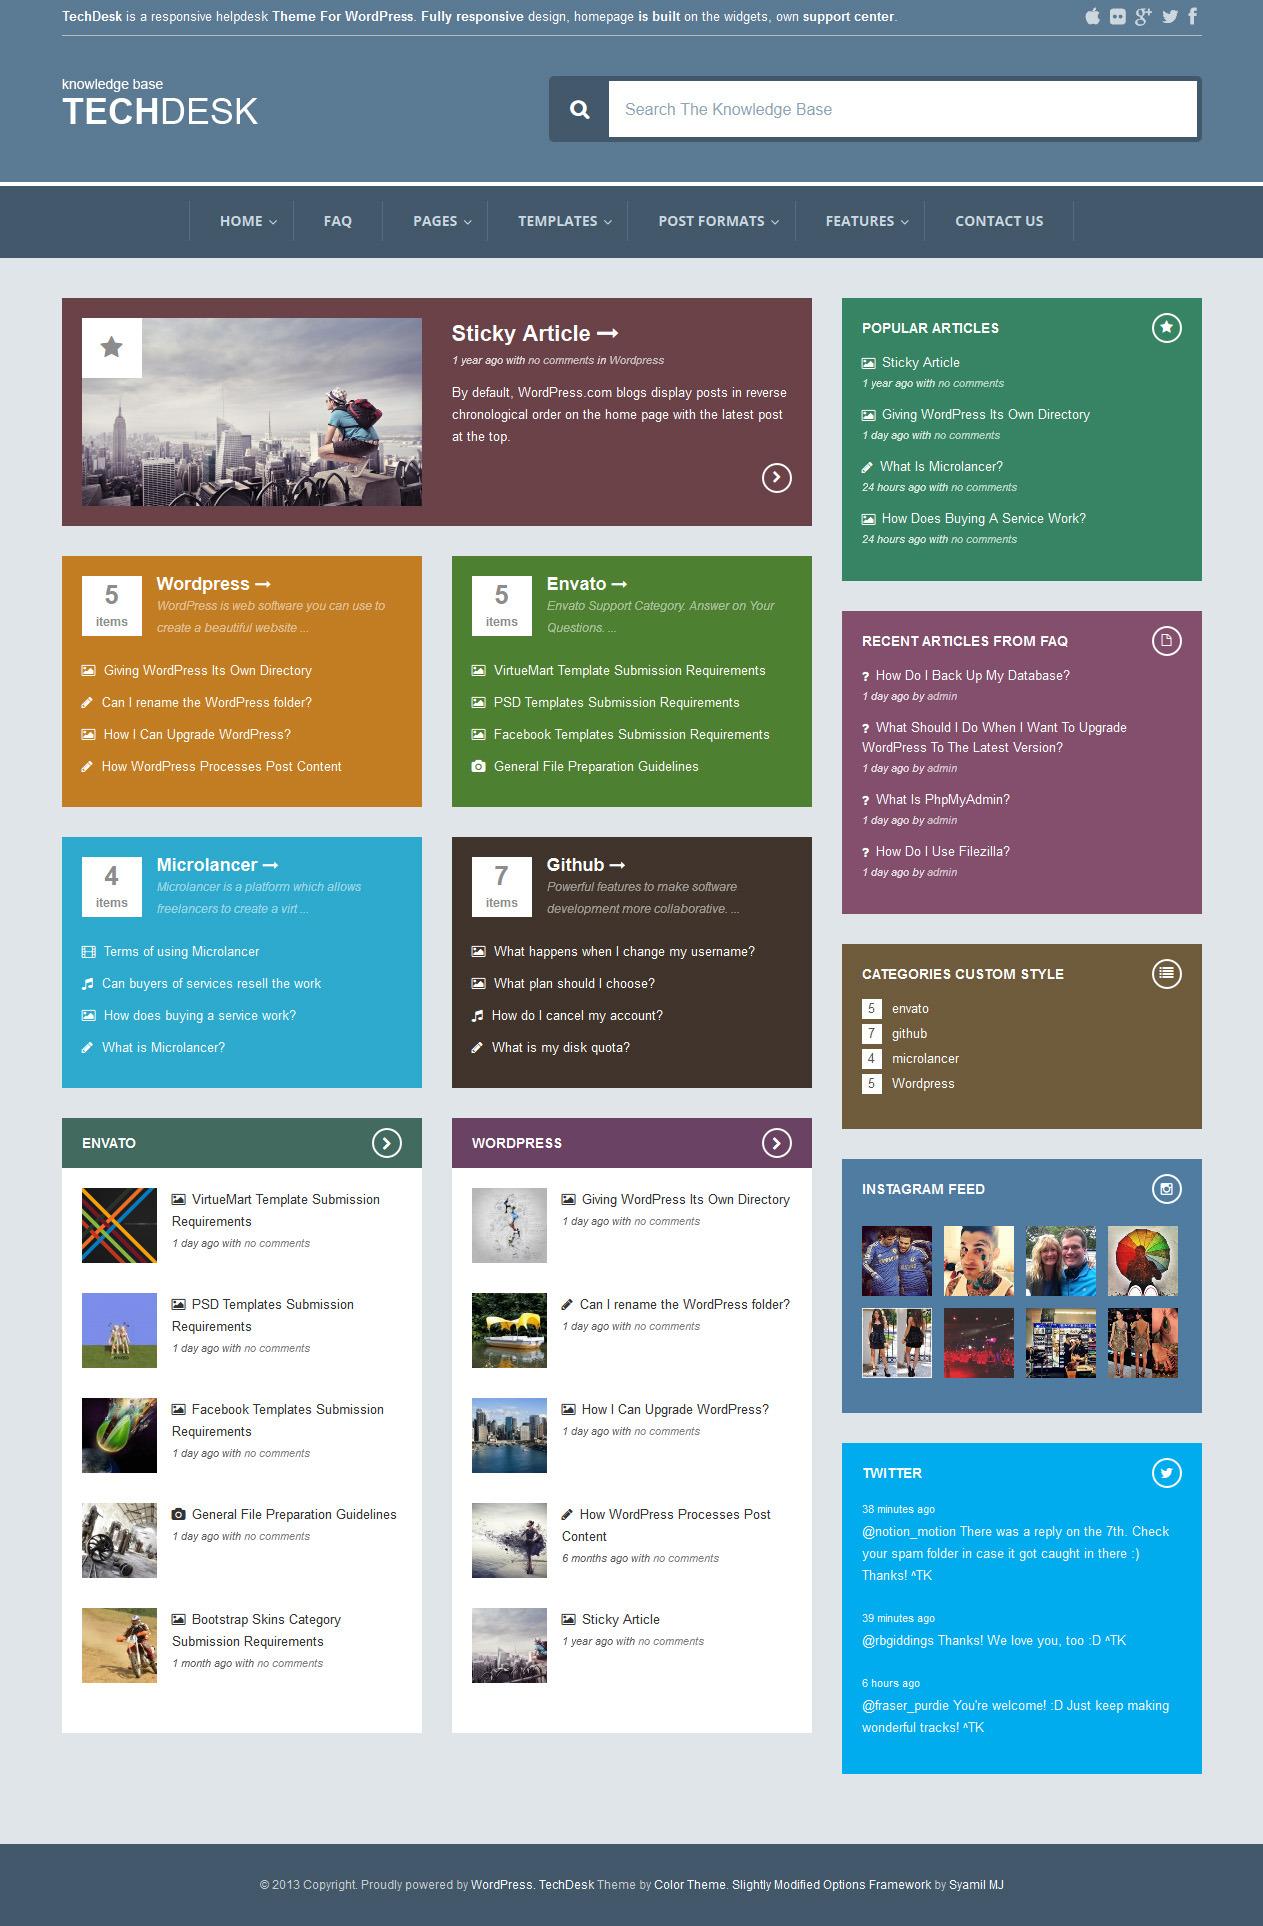 TechDesk - Responsive Knowledge Base/FAQ Theme - Home Page